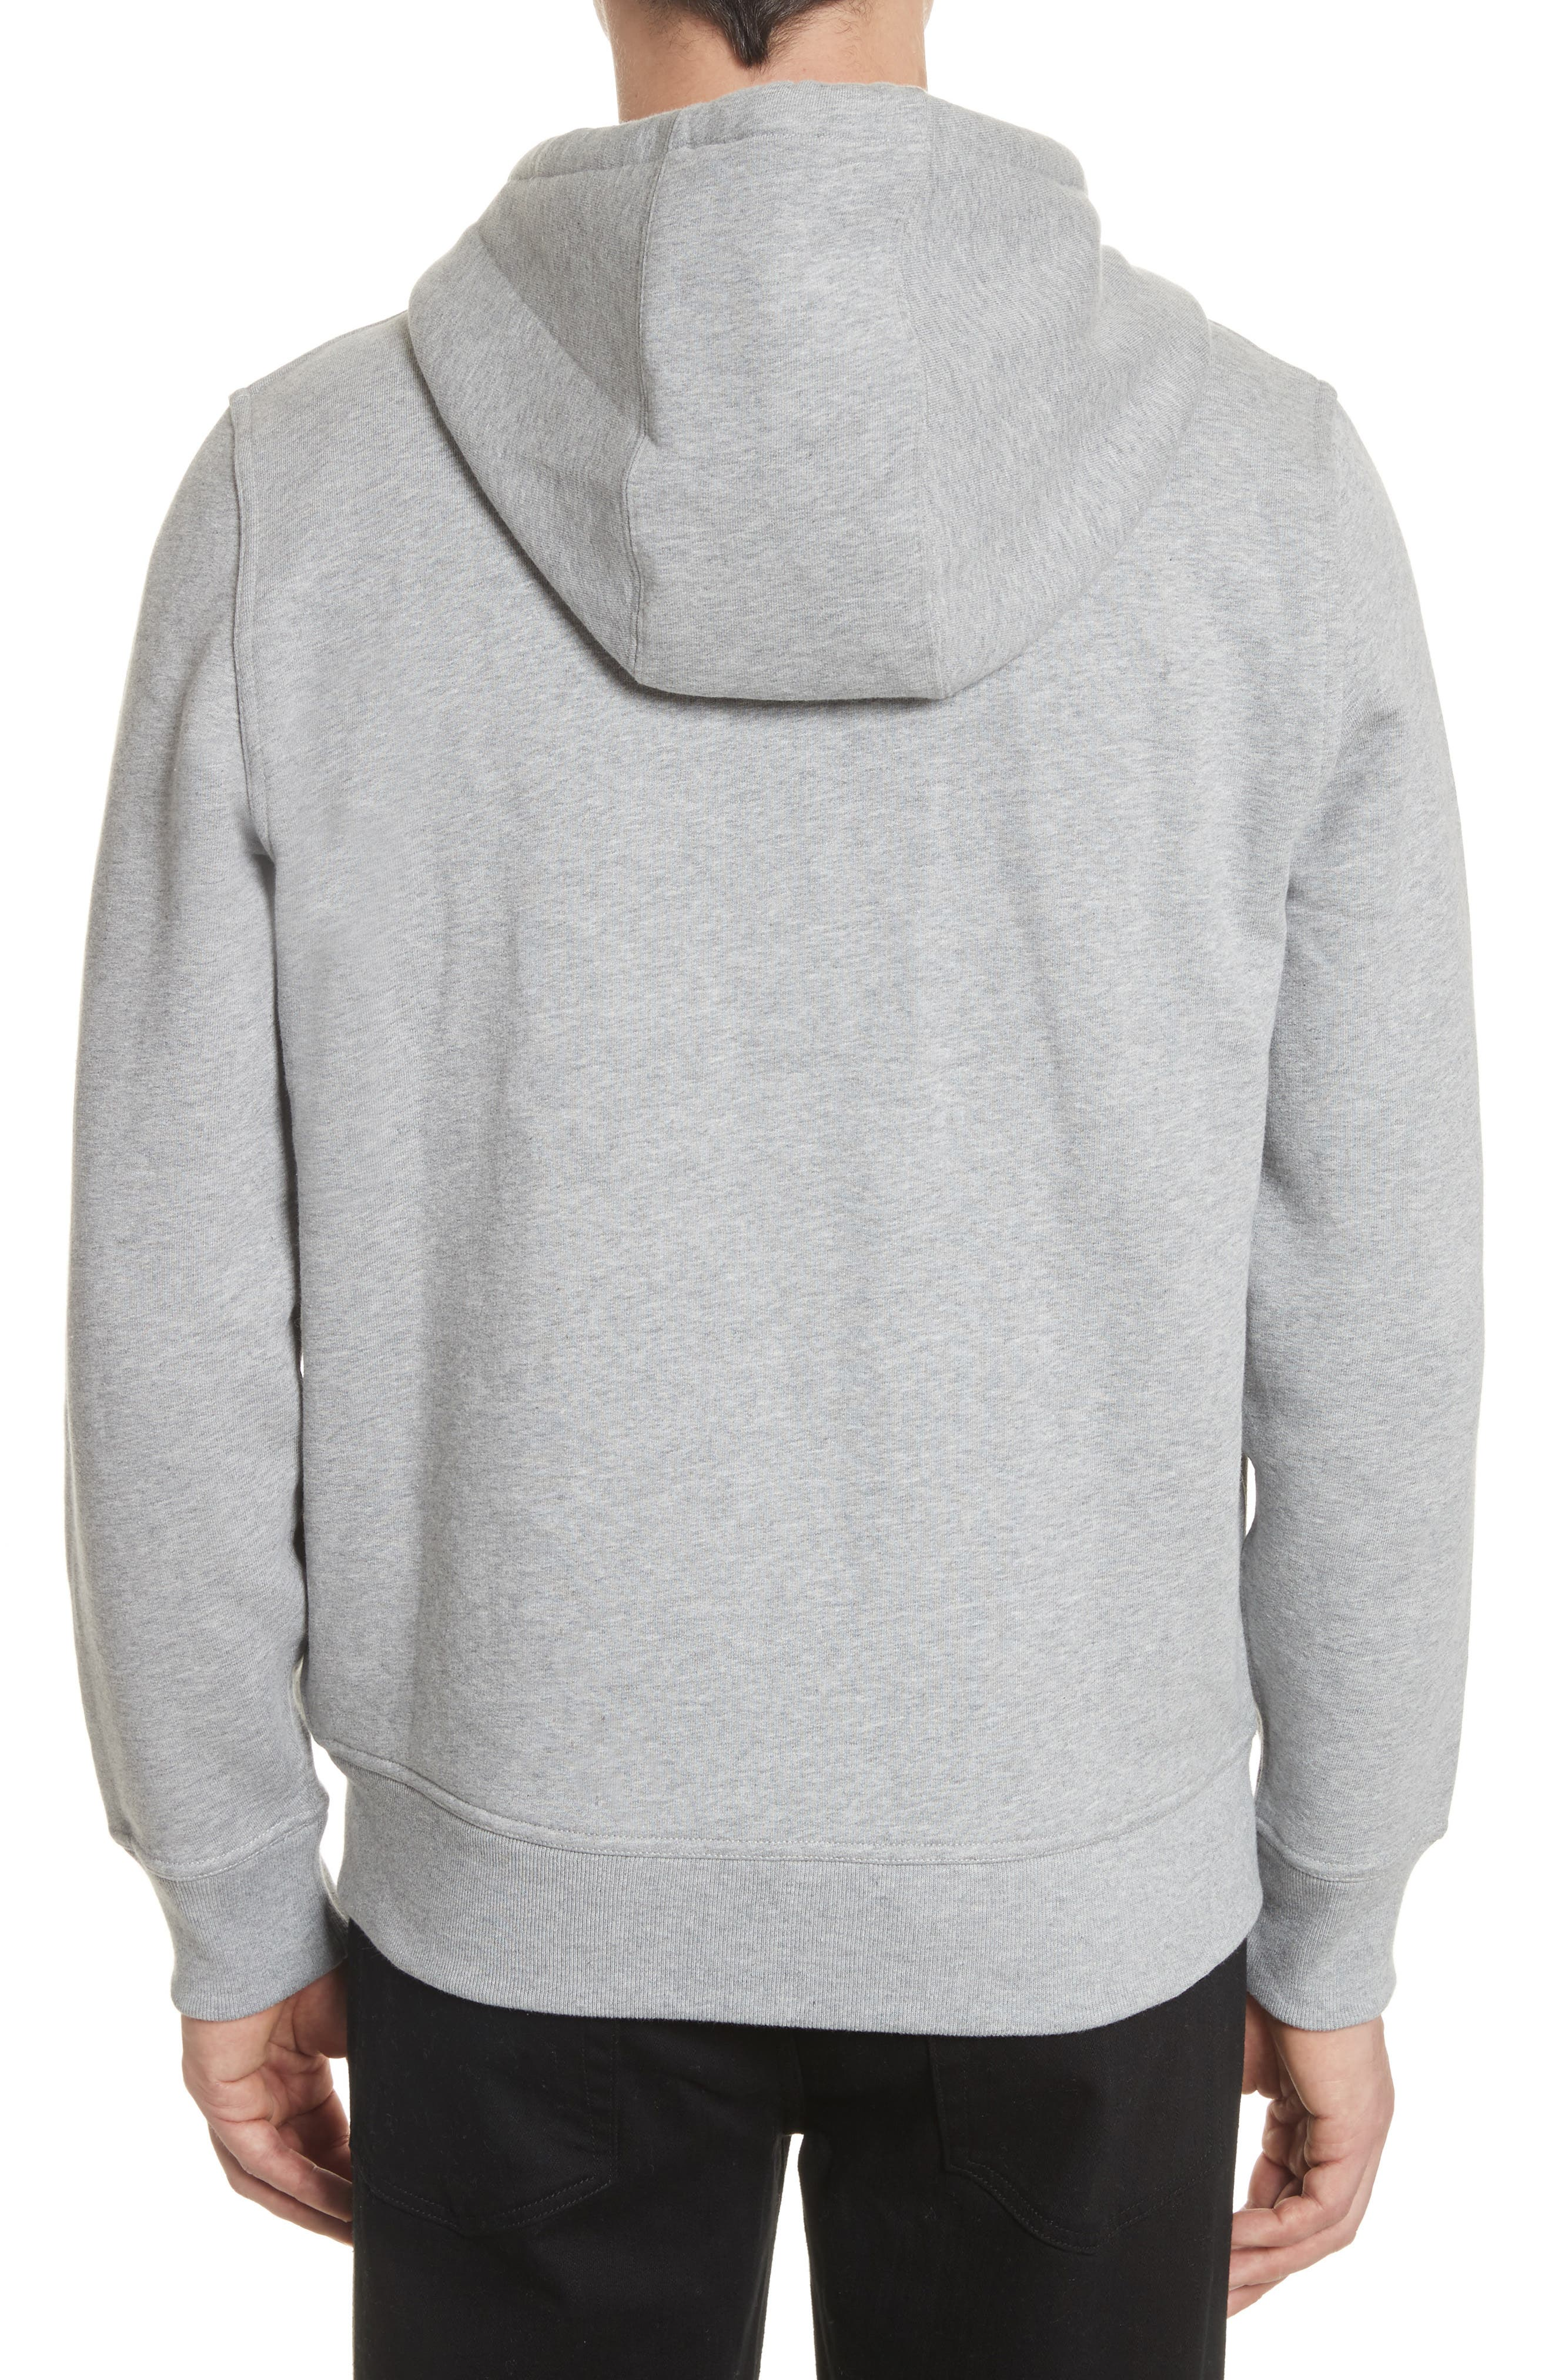 723e3407ca1f burberry sweatshirts and hoodies for men